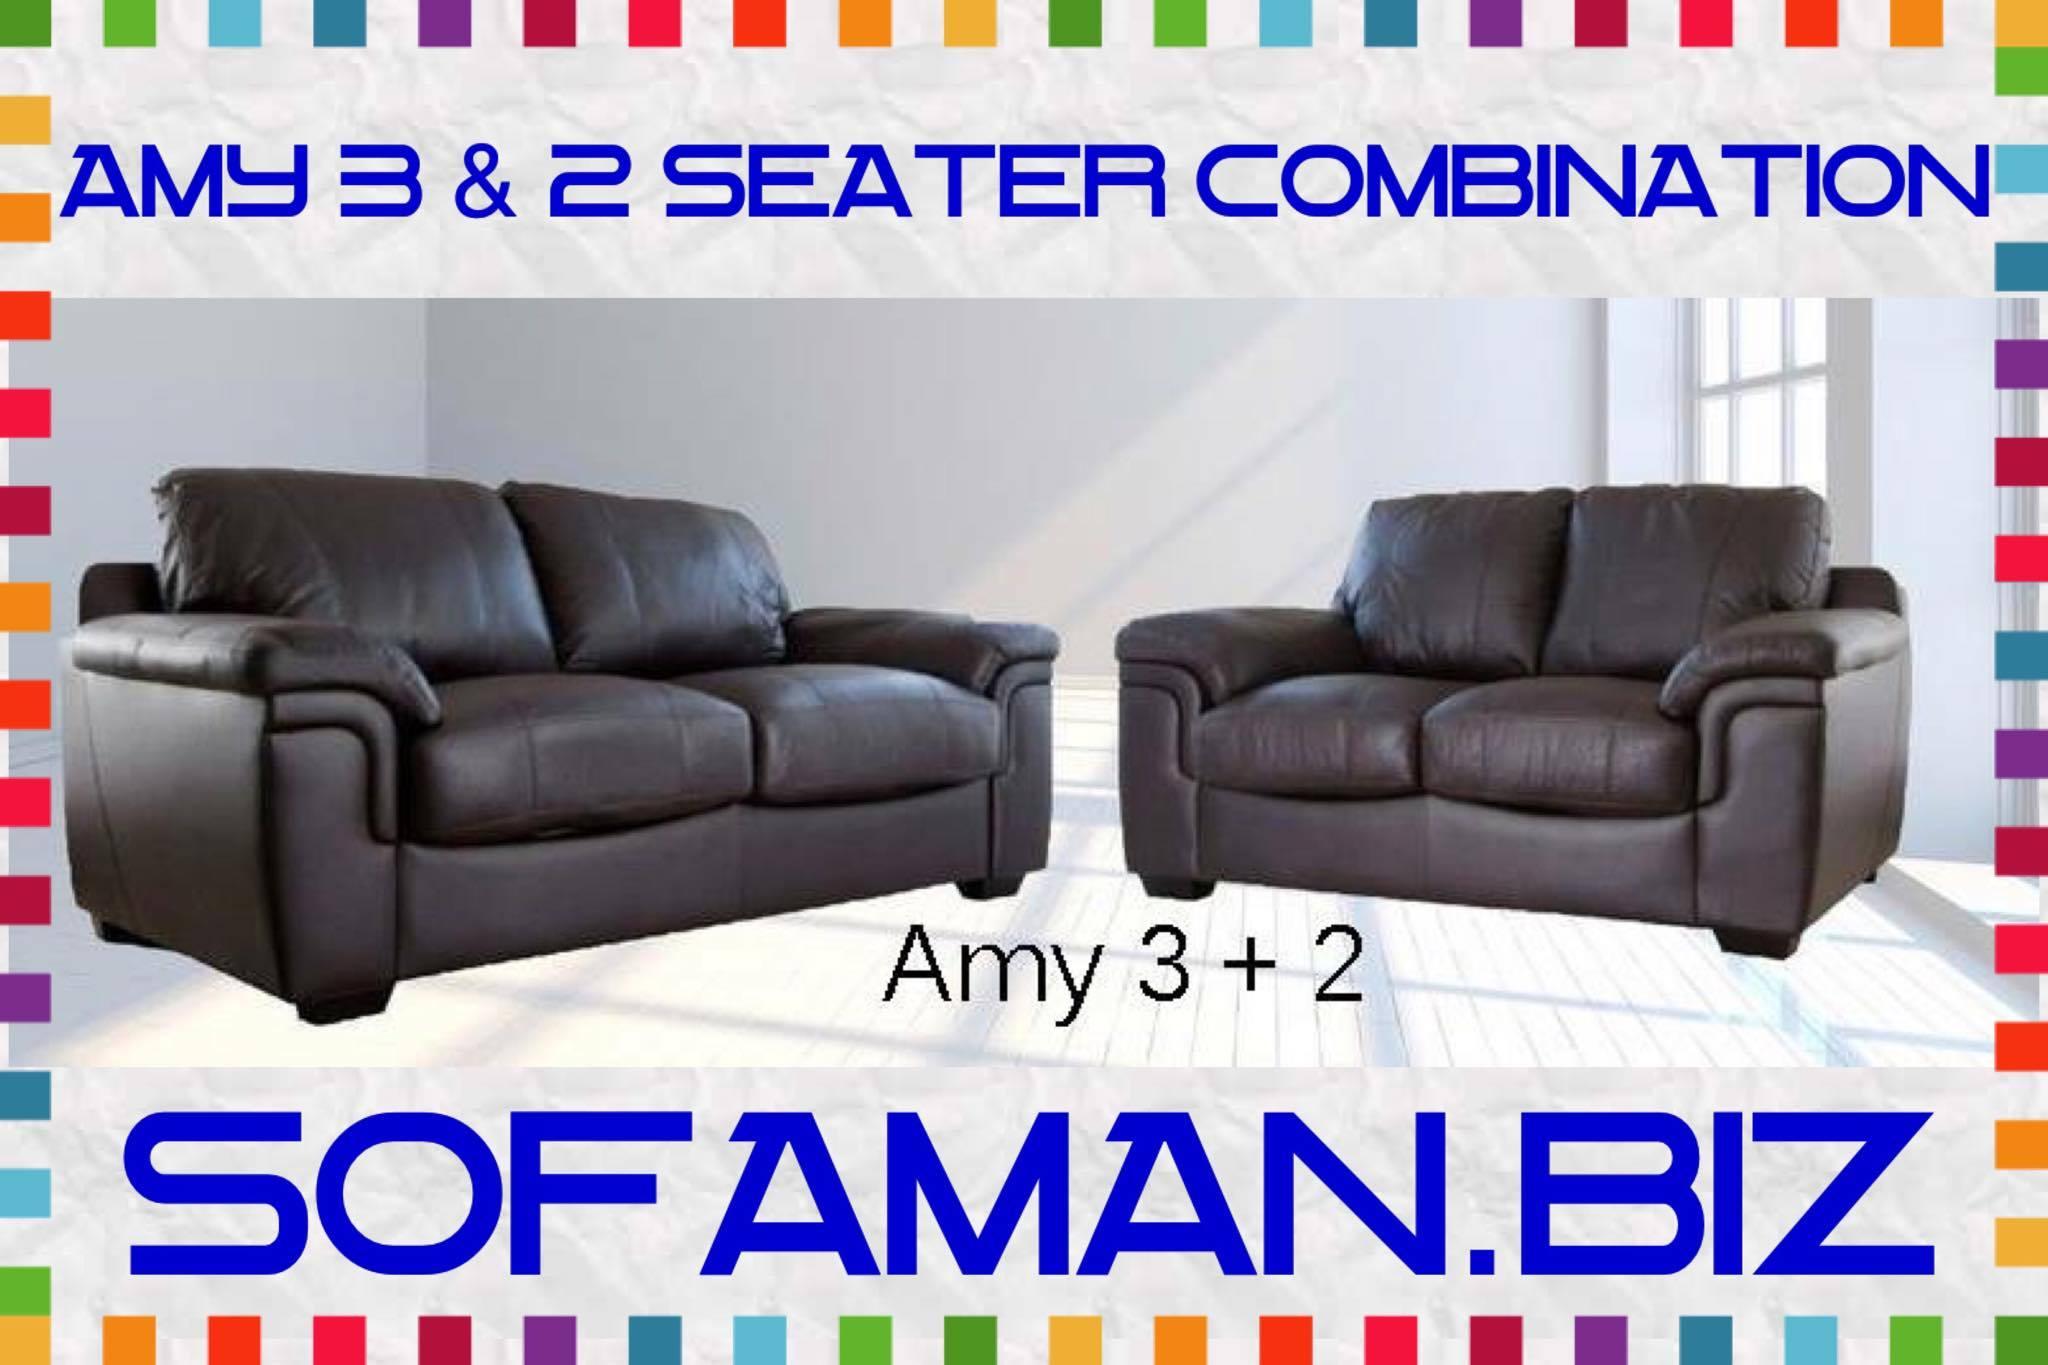 ... 6 Amy Sofa Range Sofaman.biz ...